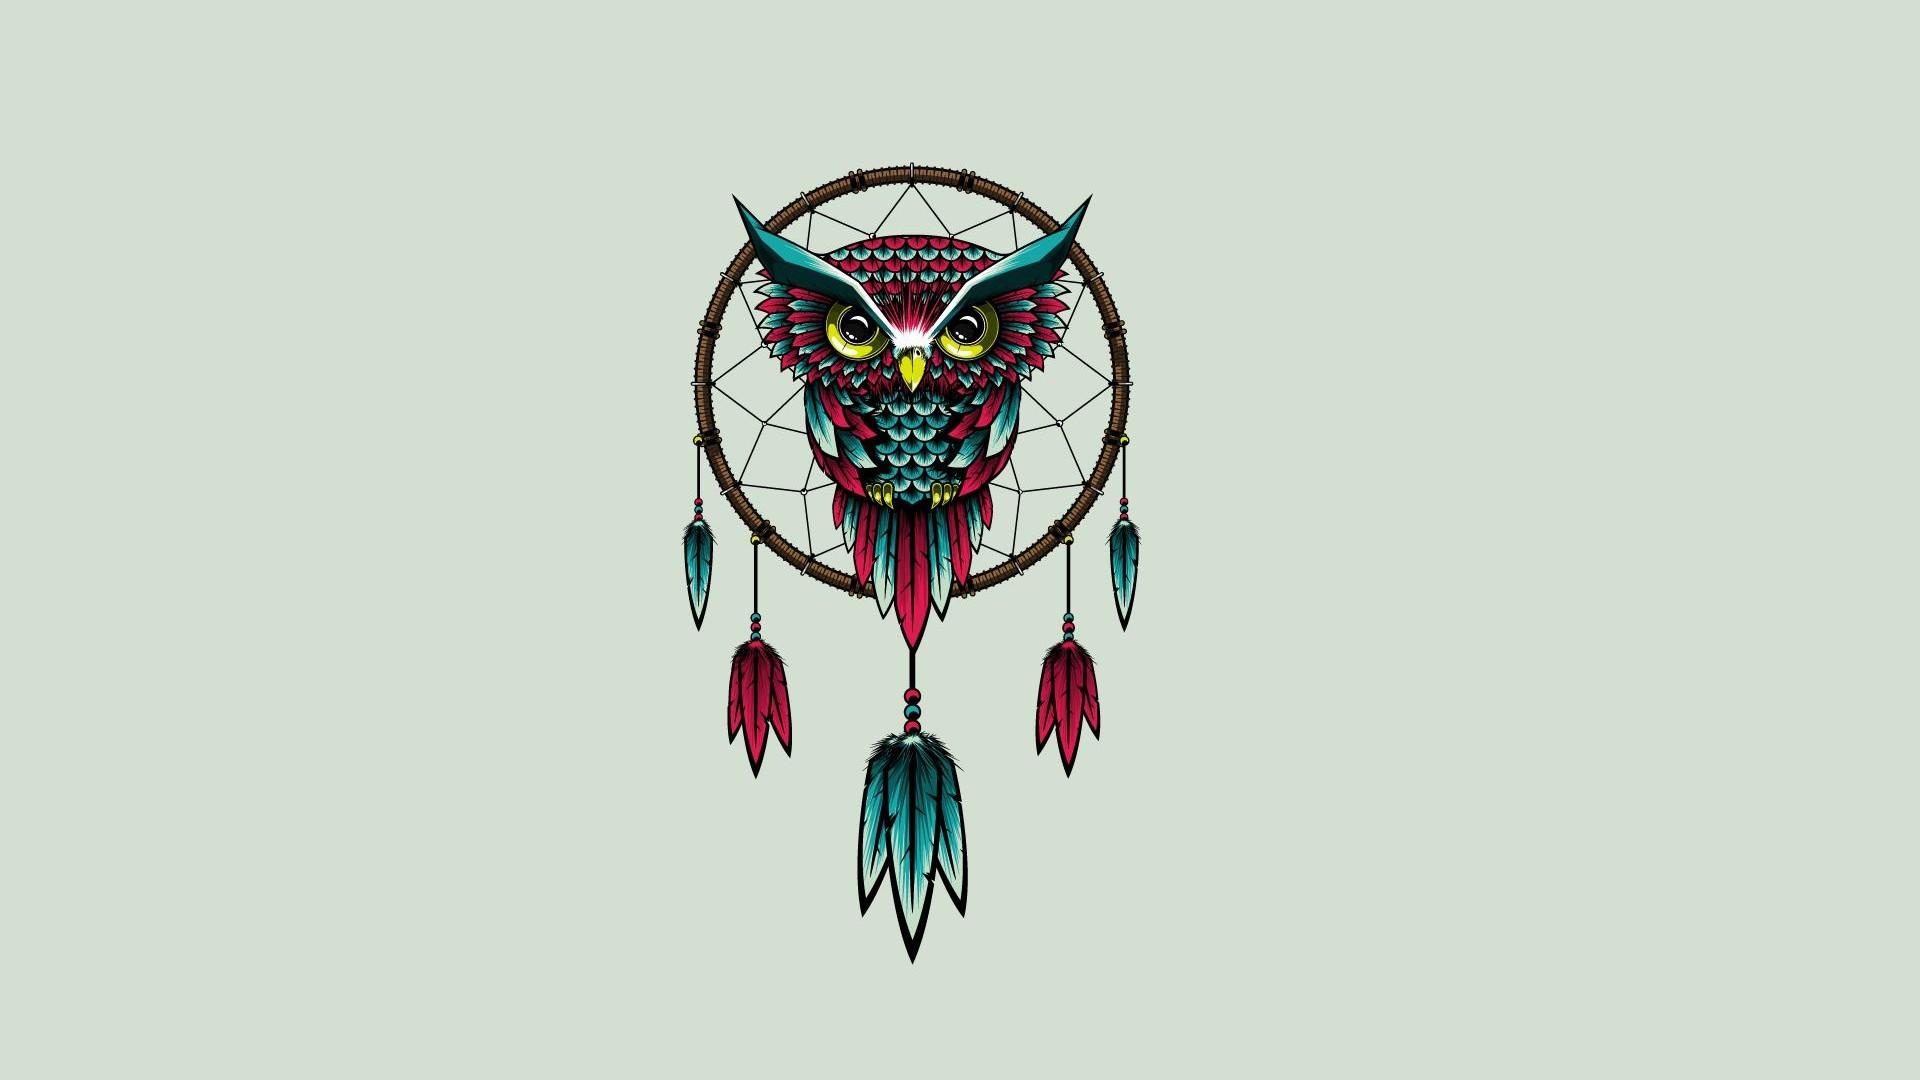 Cute Owl Wallpaper HD